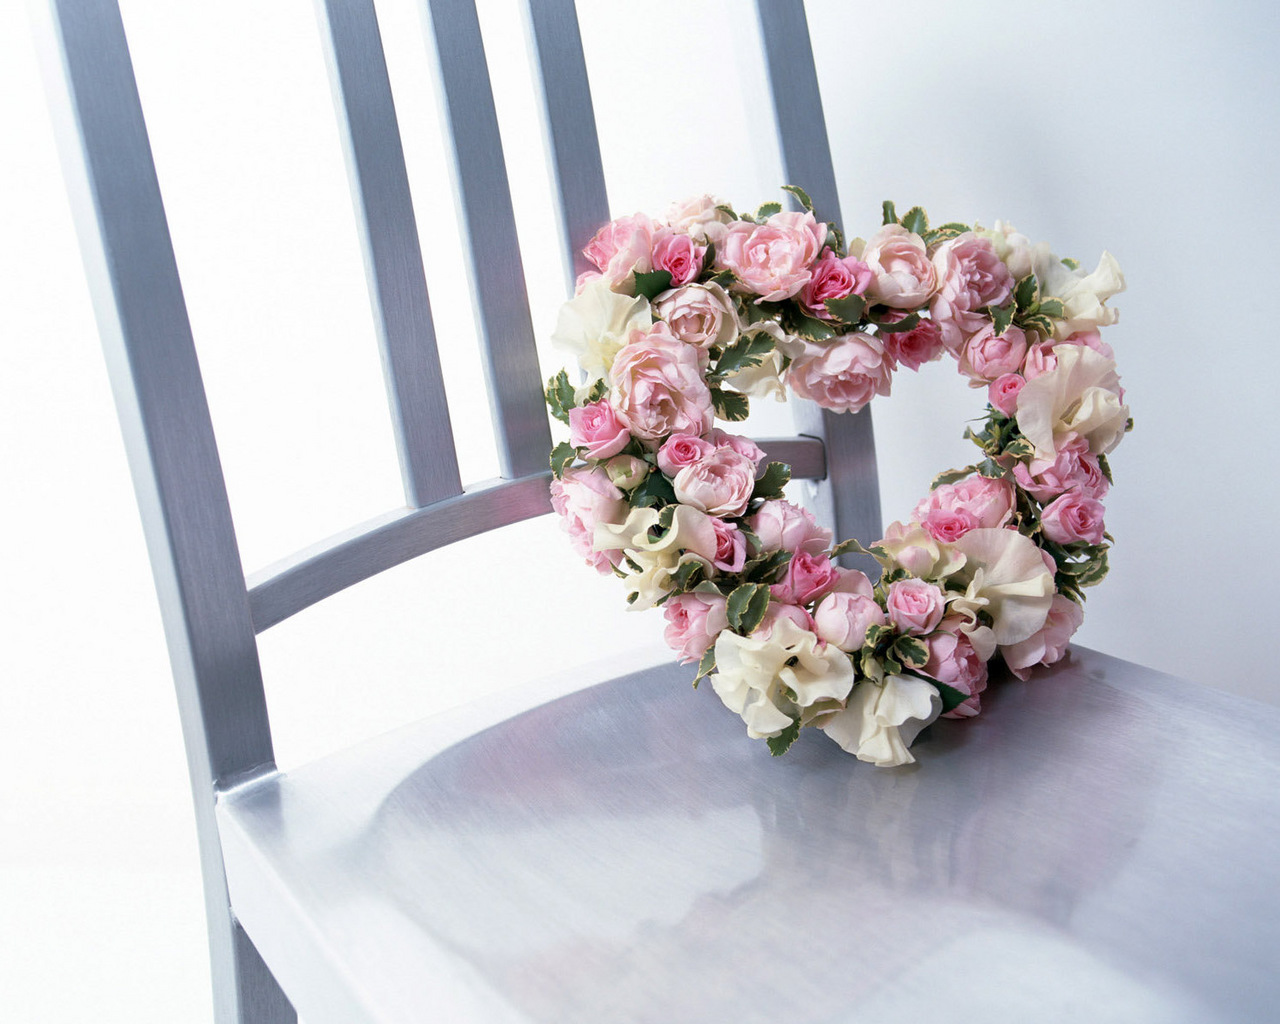 http://img.desktopwallpapers.ru/flowers/pics/dba43d3e69d3f73acd185-1280.jpg